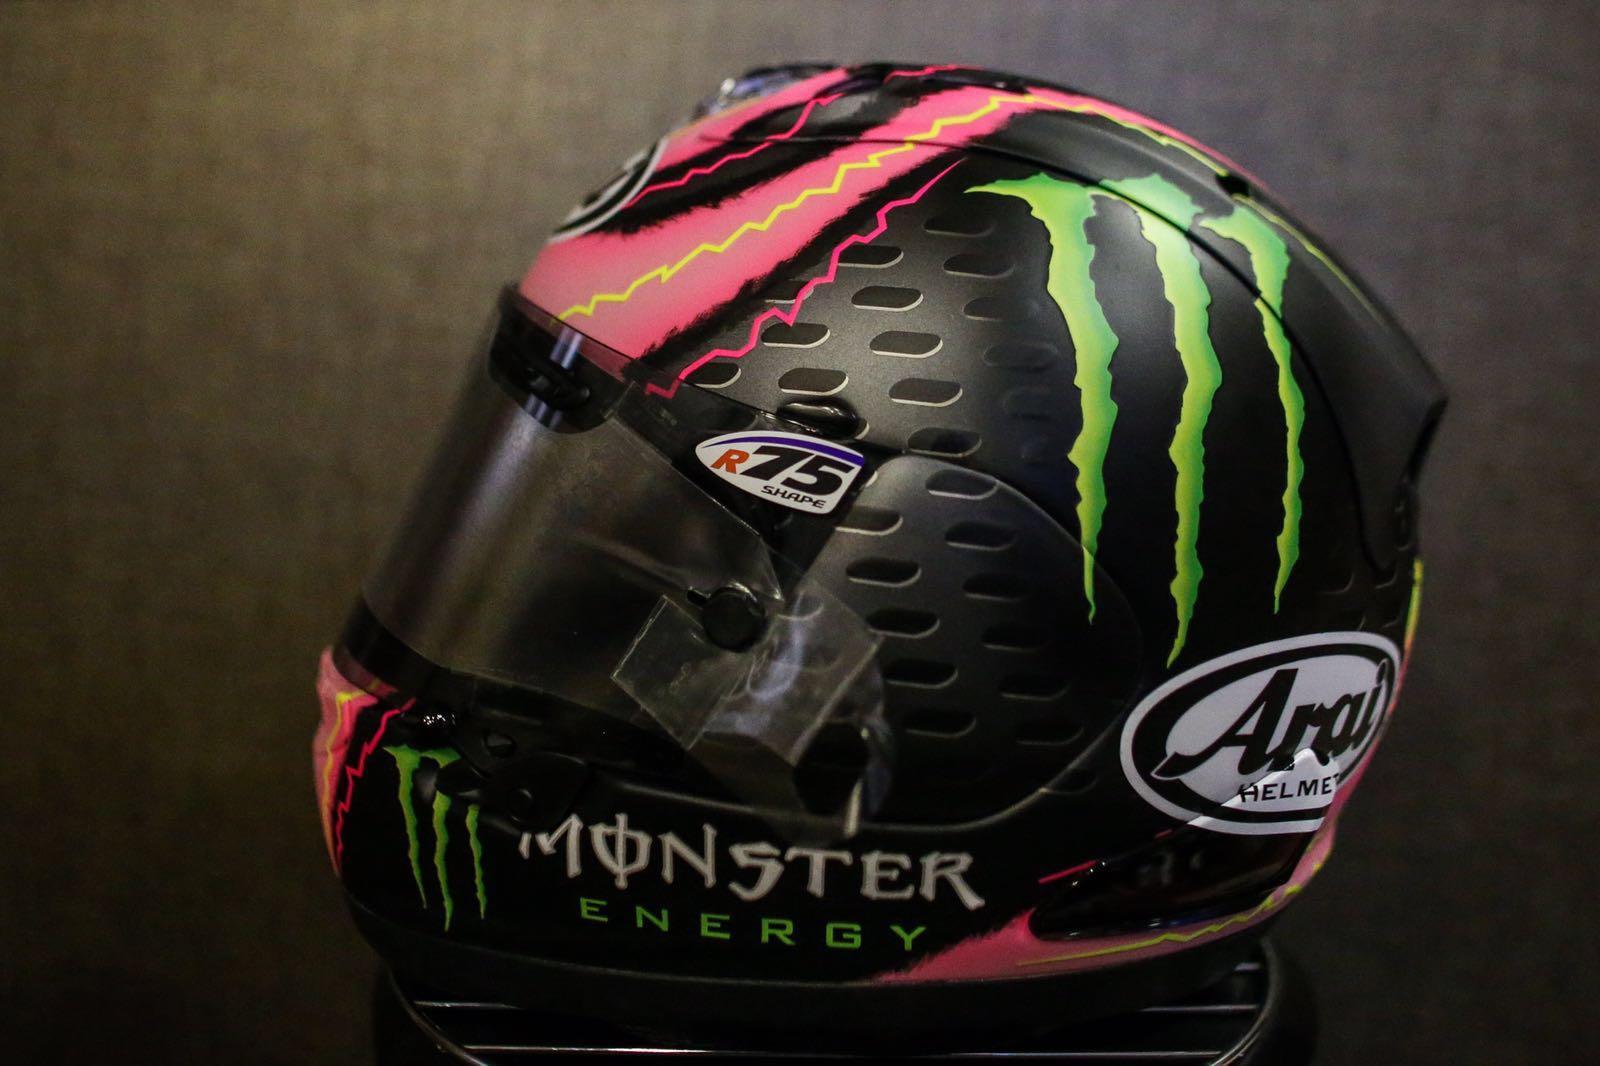 MotoGP: Crutchlow running special helmet to celebrate birth of his daughter | MCN